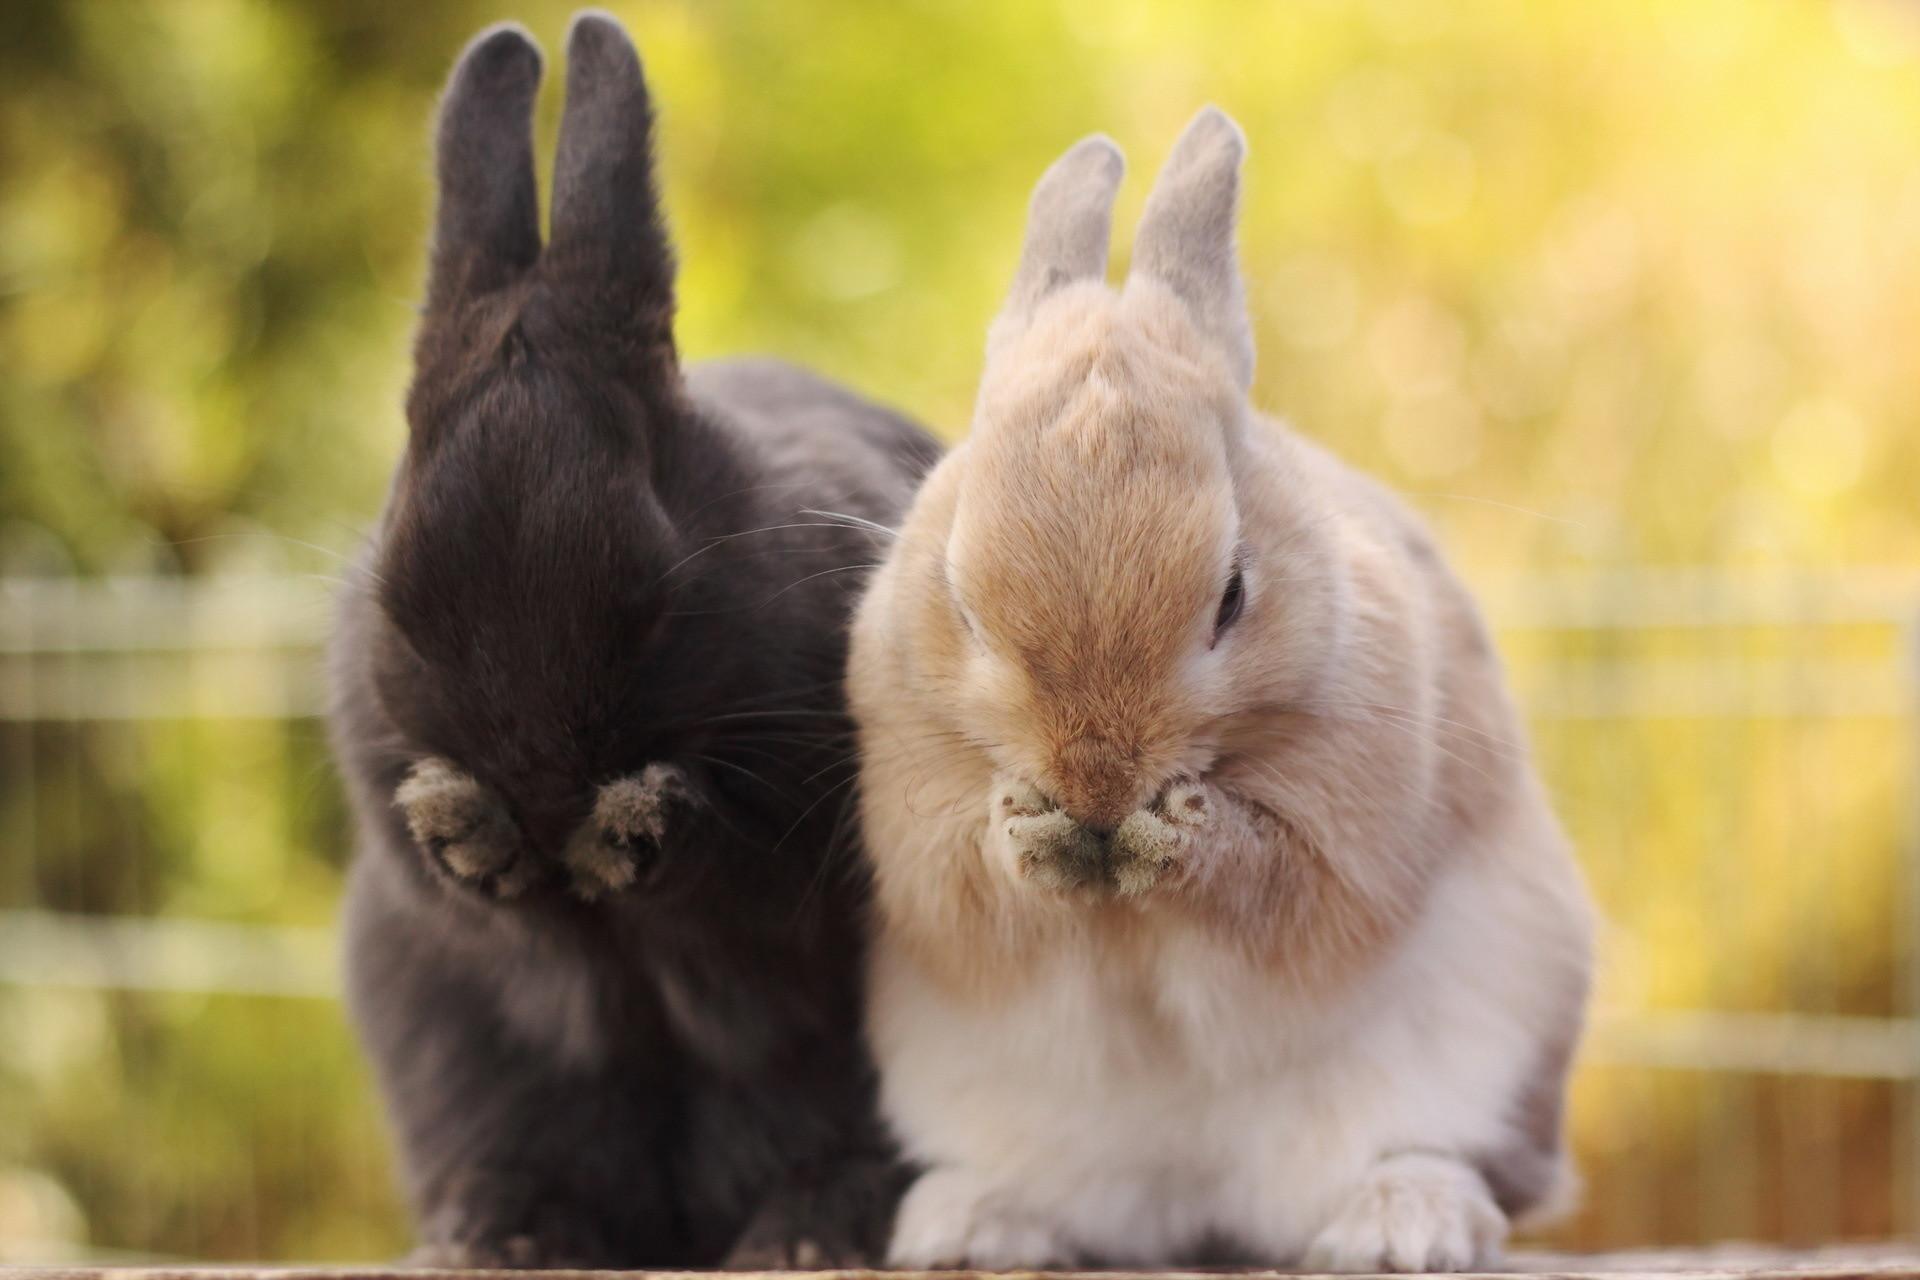 1920x1080 Baby rabbit wallpapers | Baby Animals